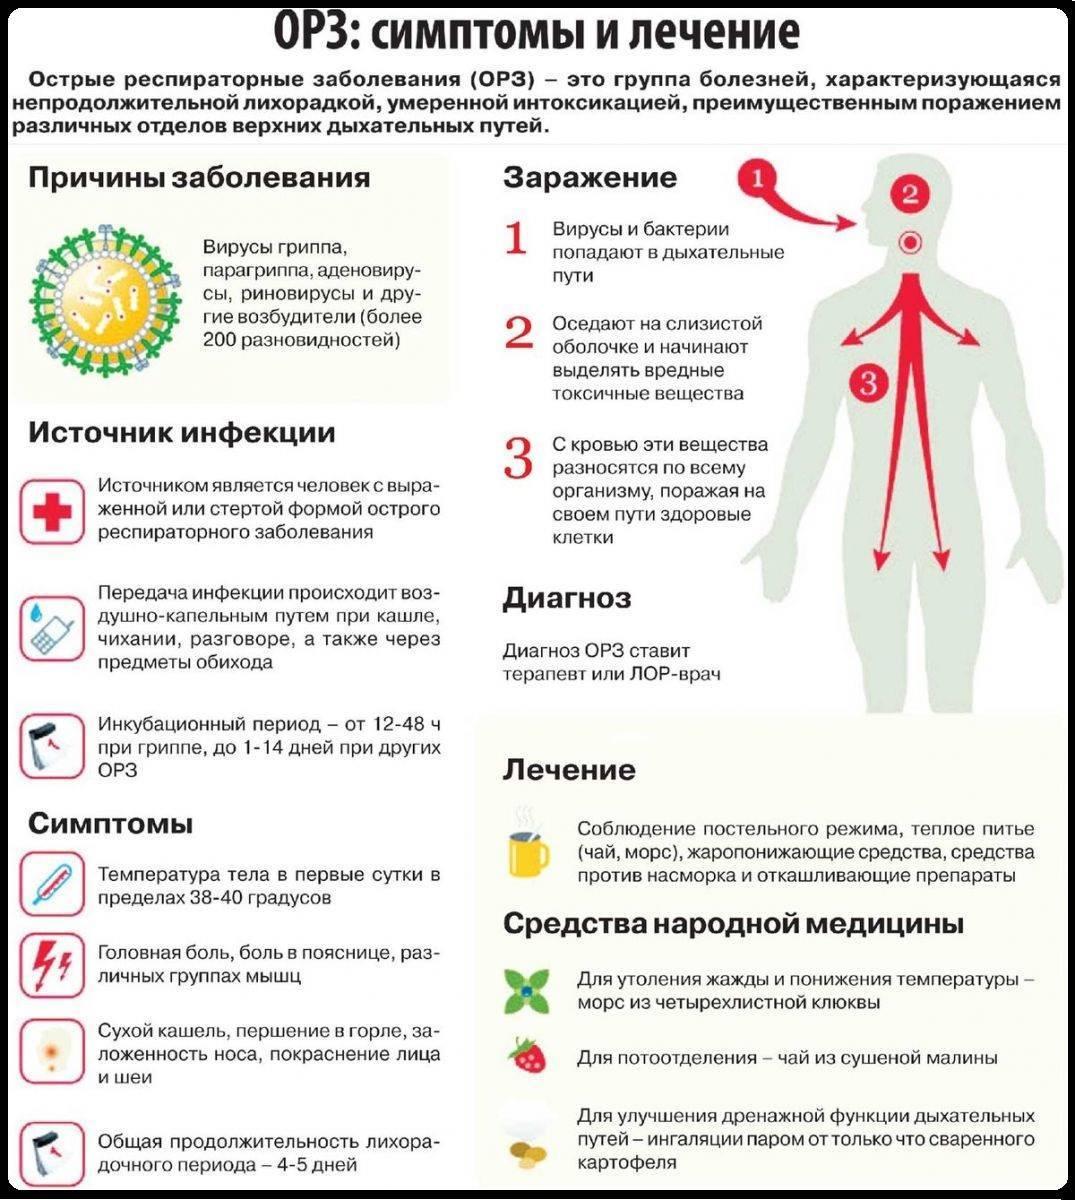 Полиомиелит: признаки заболевания, лечение и профилактика